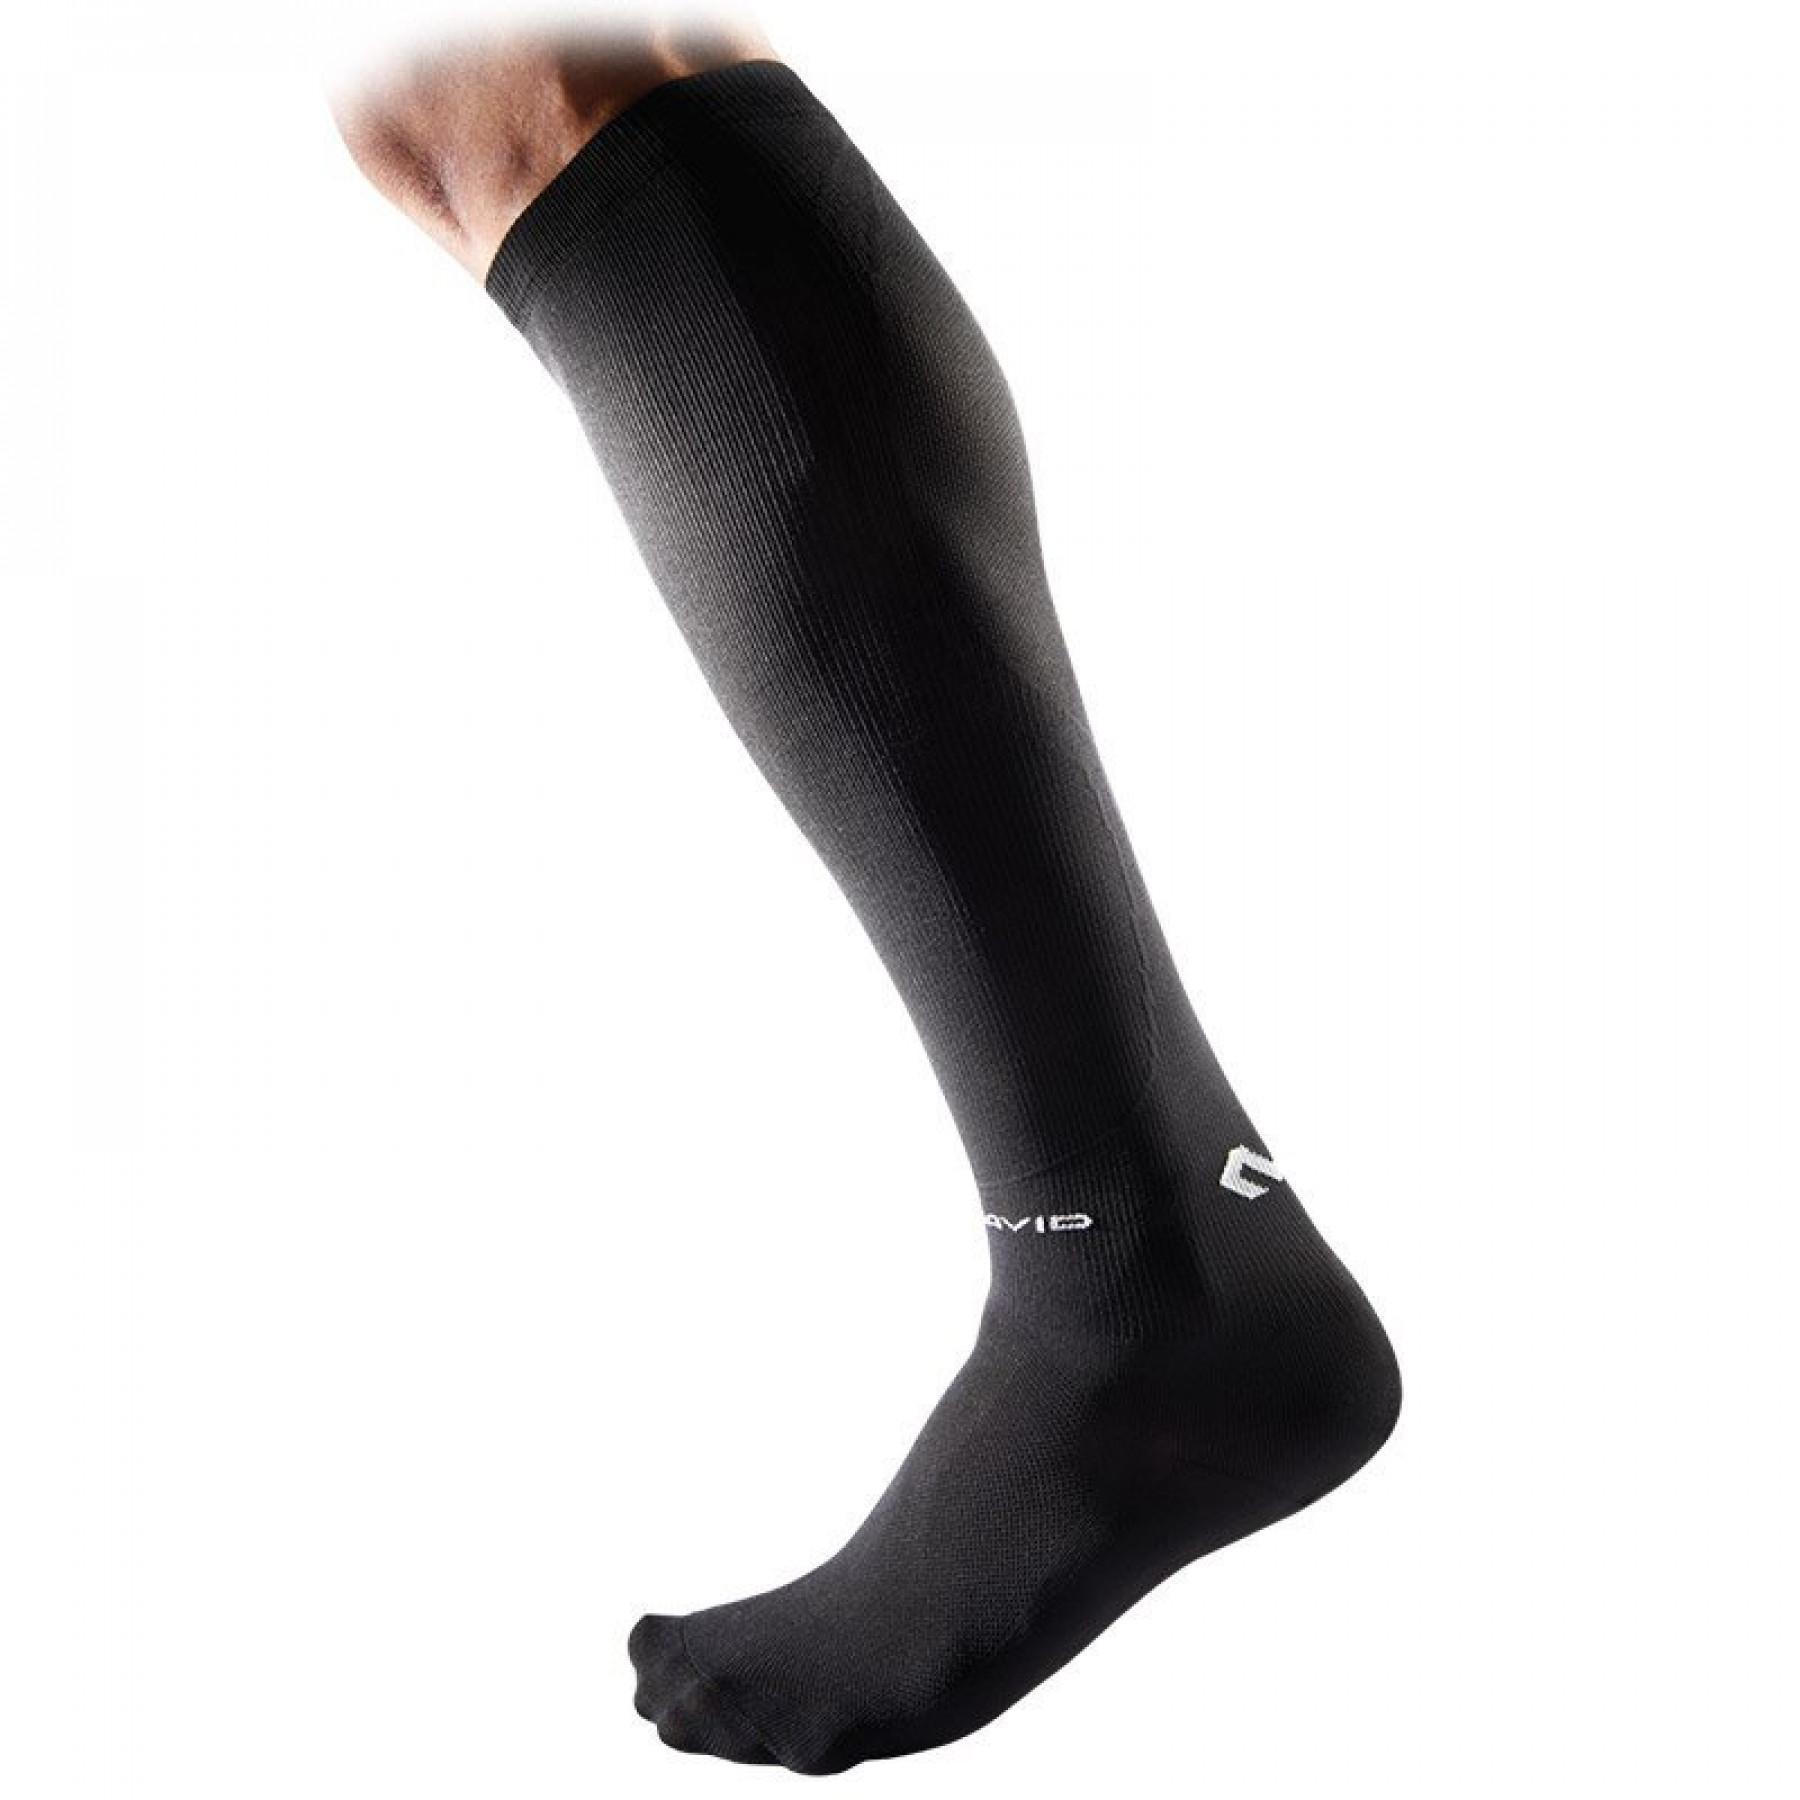 Compression socks McDavid ELITE Recovery